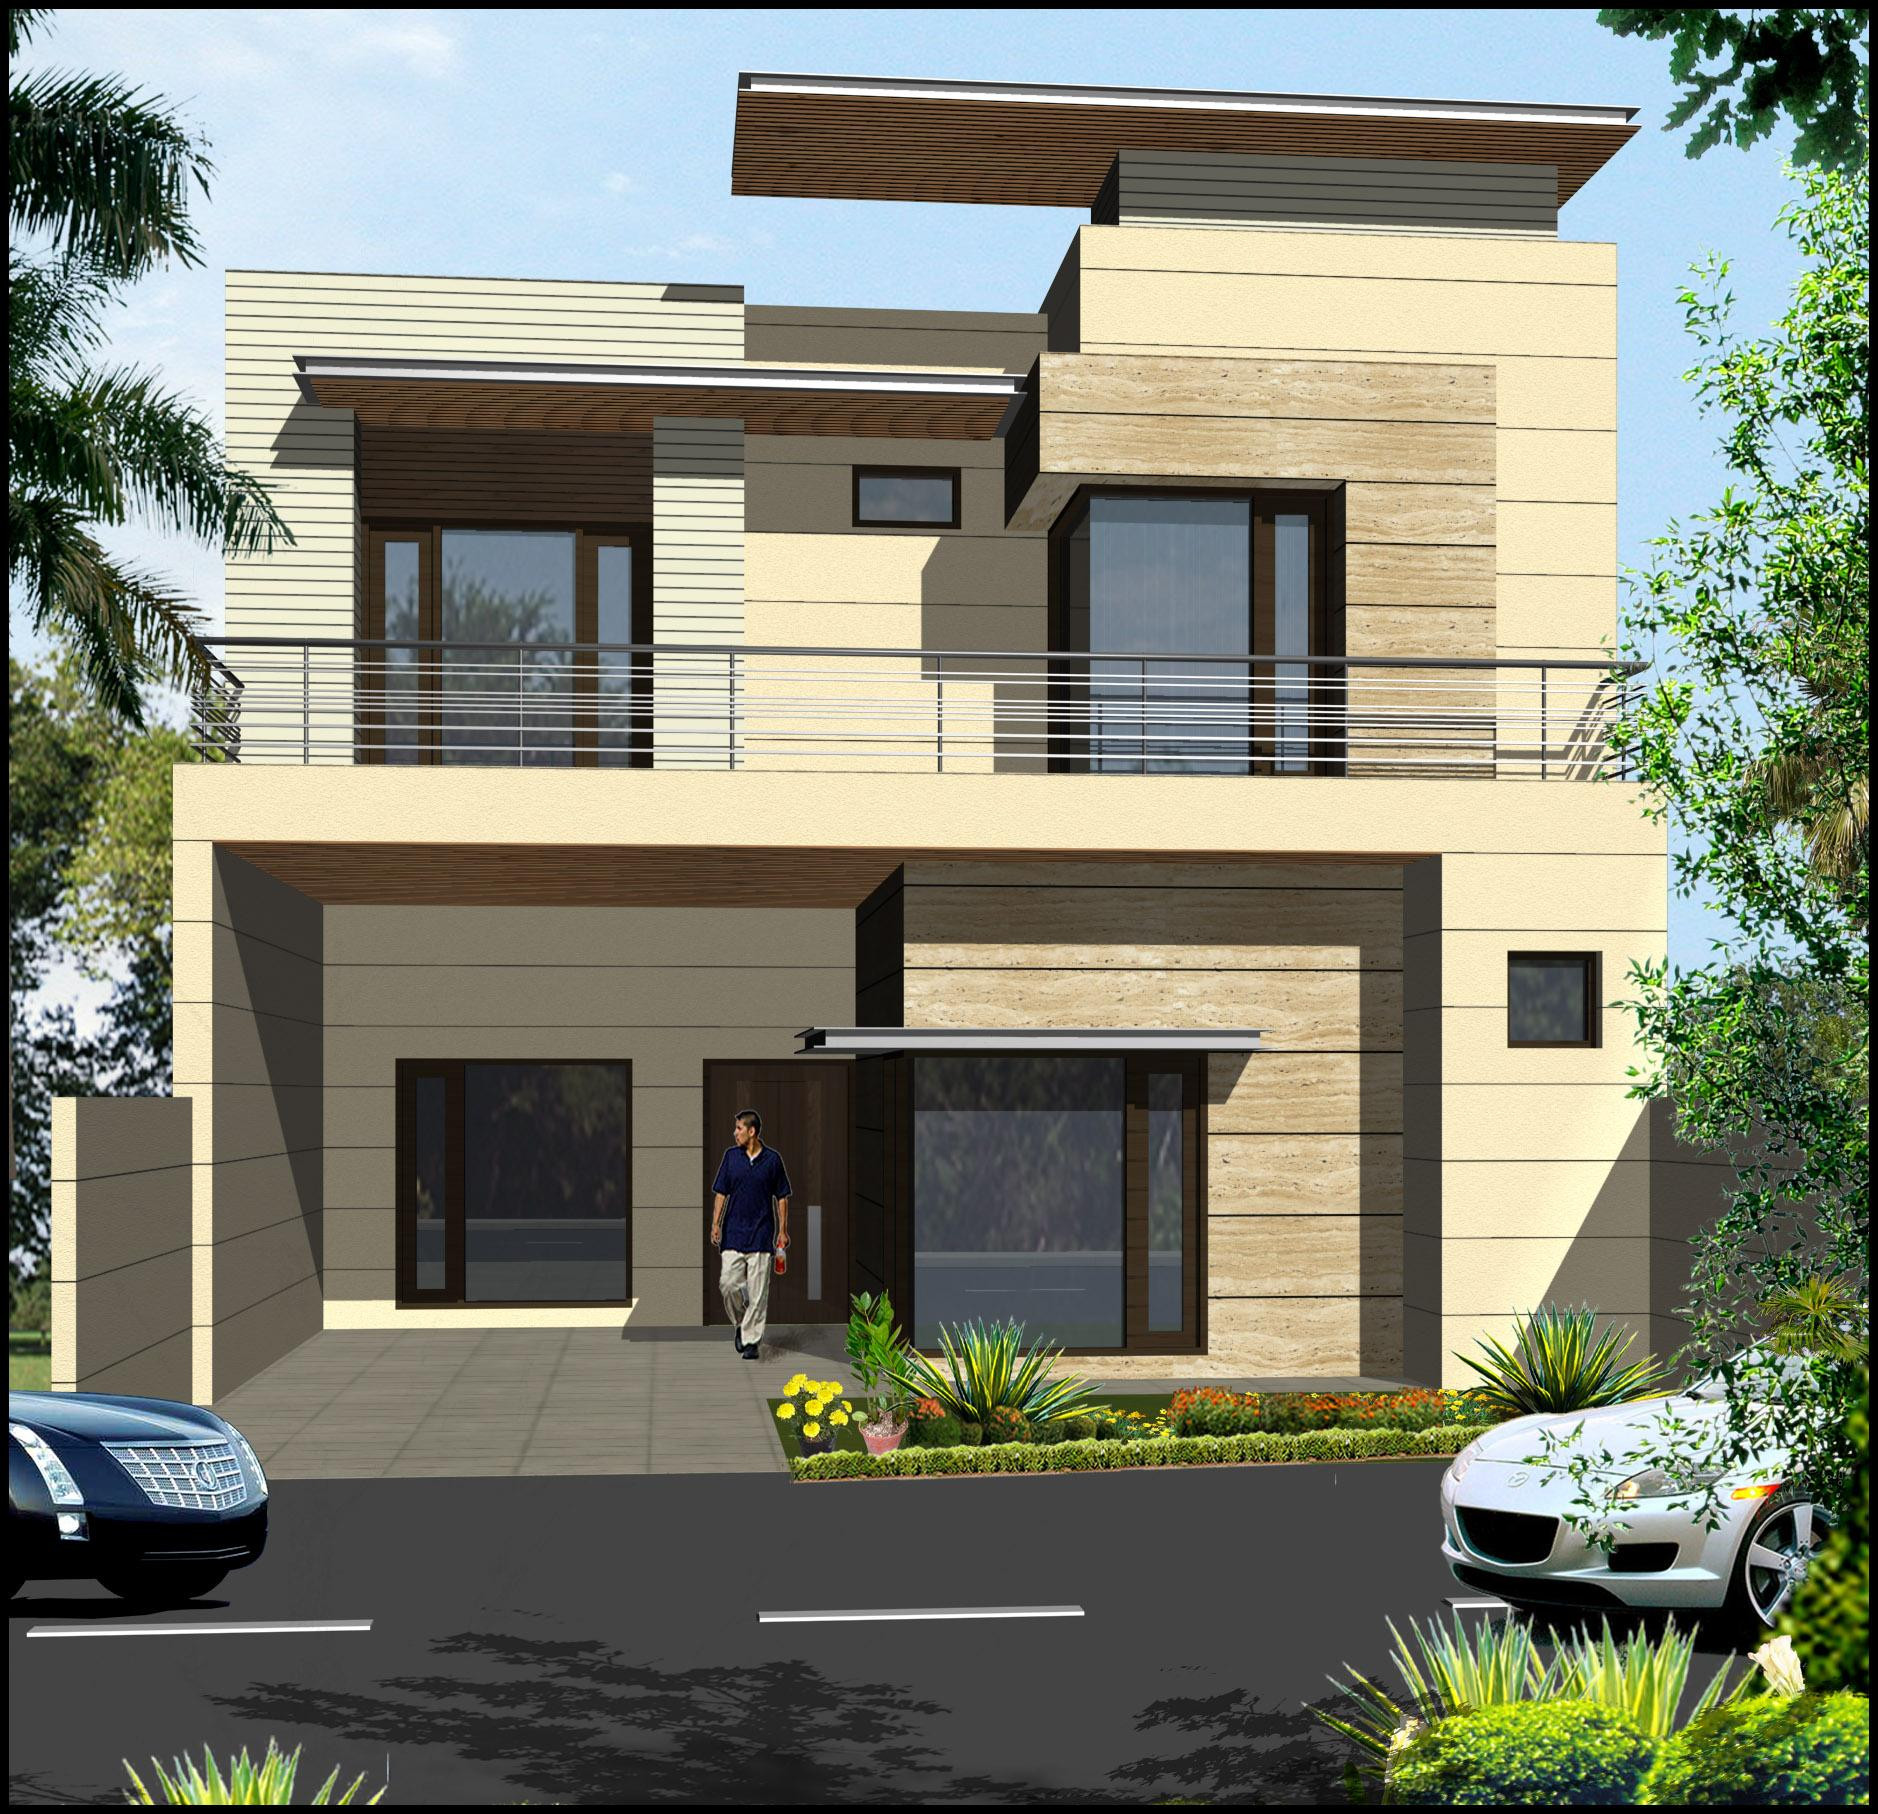 House compound wall design joy studio design gallery best design - Front Front Elevation Tiles Design L Front Elevation Indian House Designs Cdn Joystudiodesign